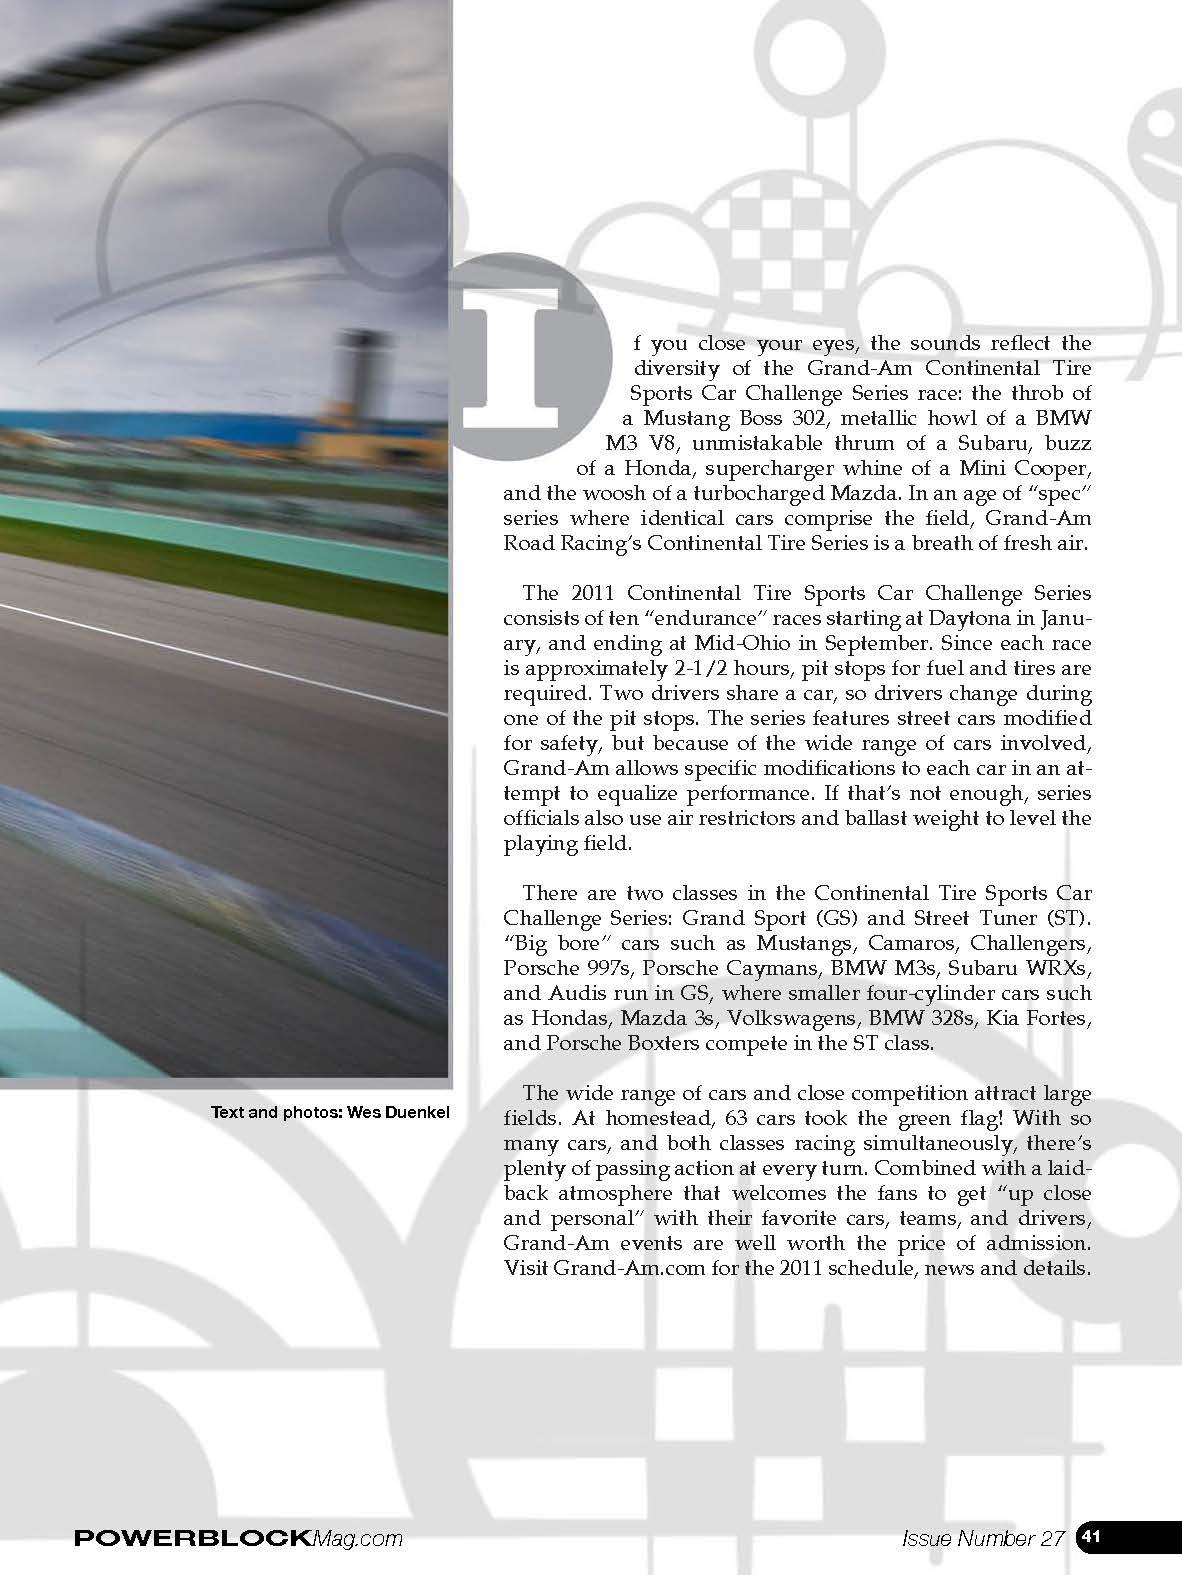 powerblockmagazine_issue27_Page_02.jpg